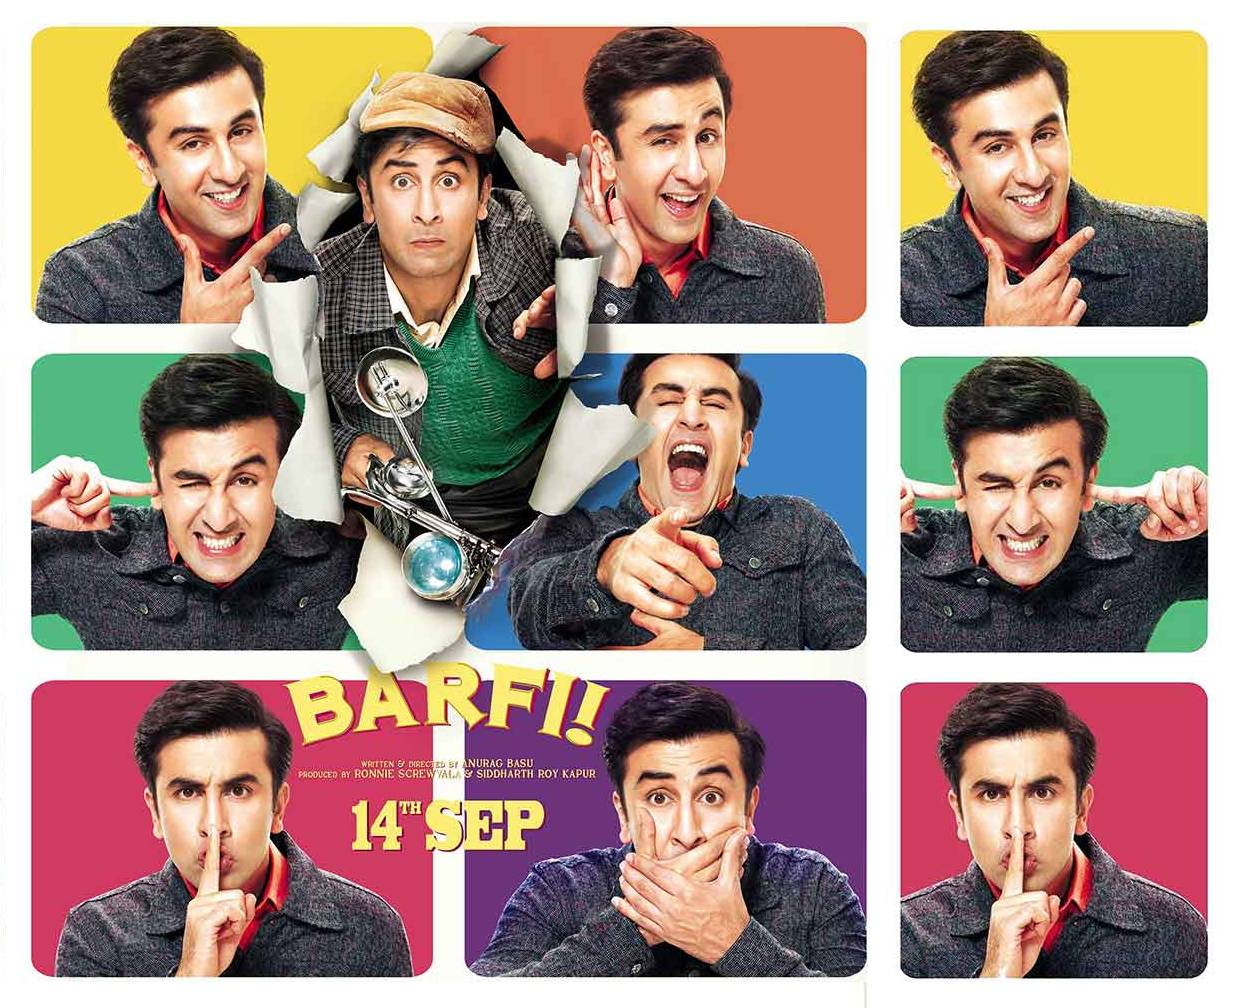 http://2.bp.blogspot.com/-vVN6DL3cqLA/UENem1yw72I/AAAAAAAACIM/A1QcBaTY57w/s1600/Barfi+movie+hd+poster.jpg